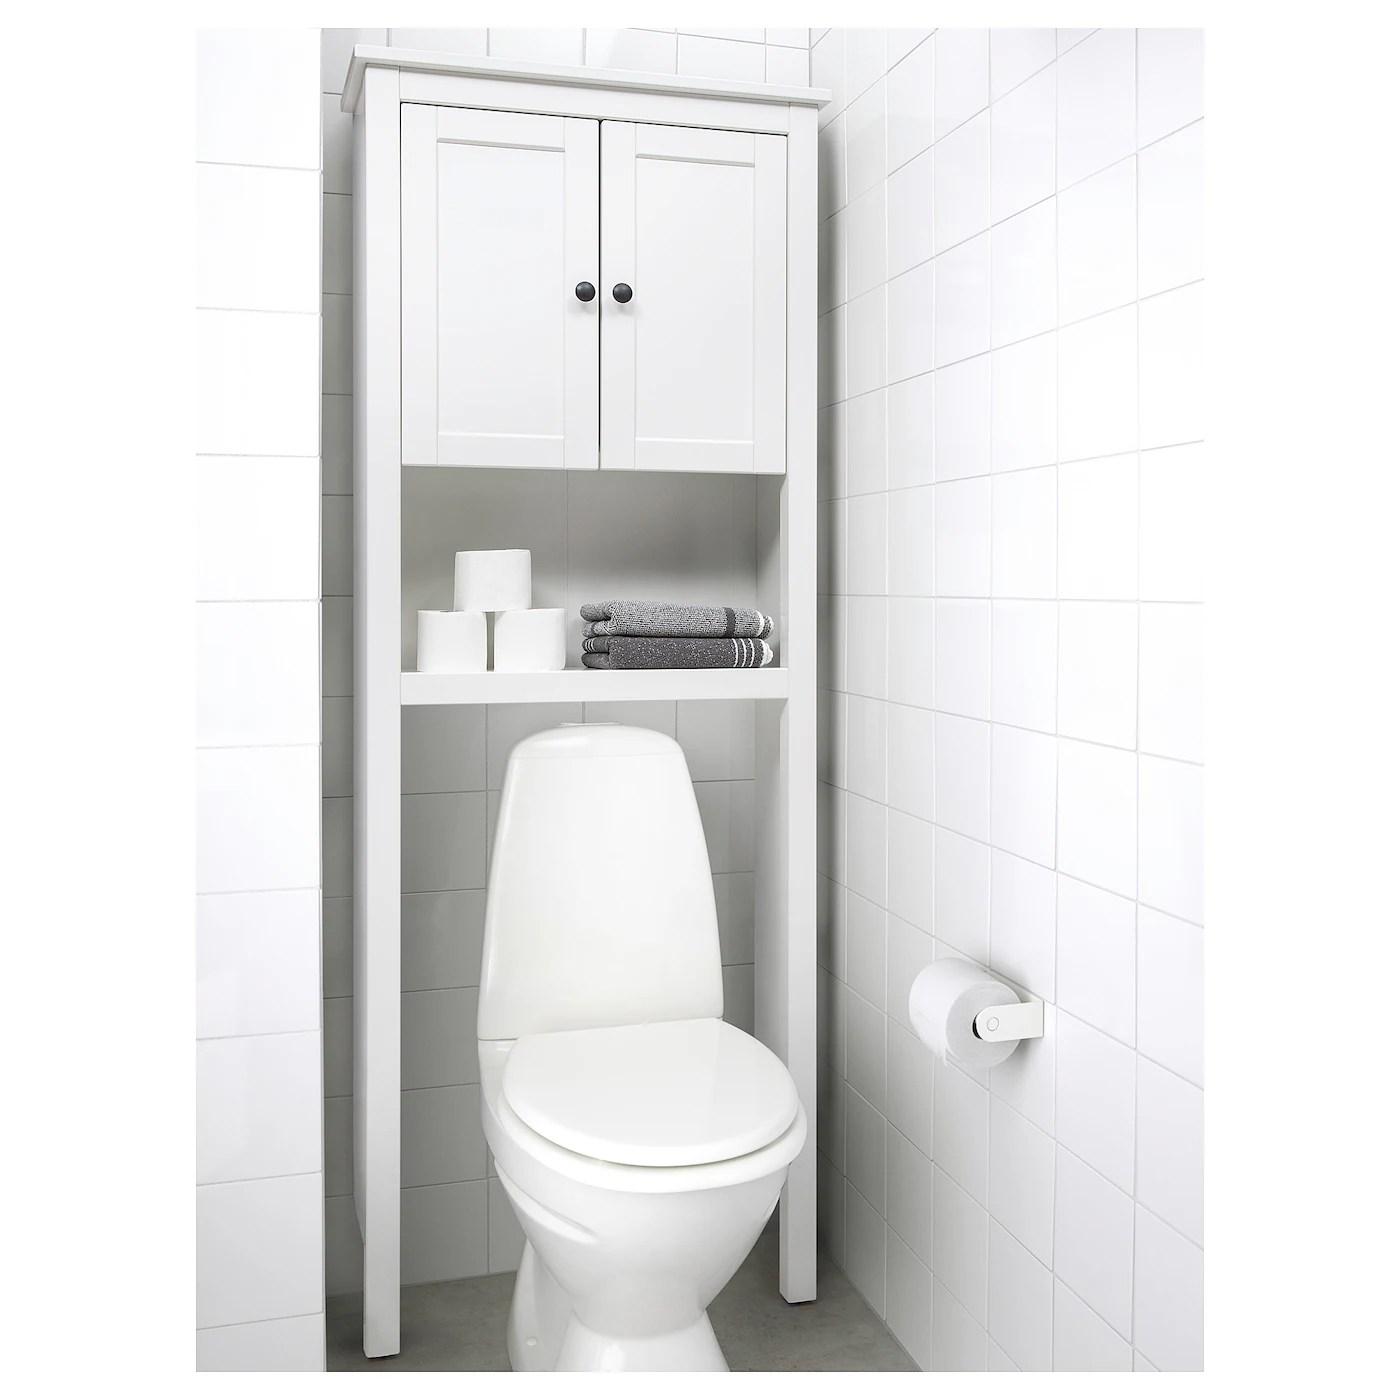 Hemnes Etagere Salle De Bains Blanc 291 8x97 8x78 74x25x198 Cm Ikea